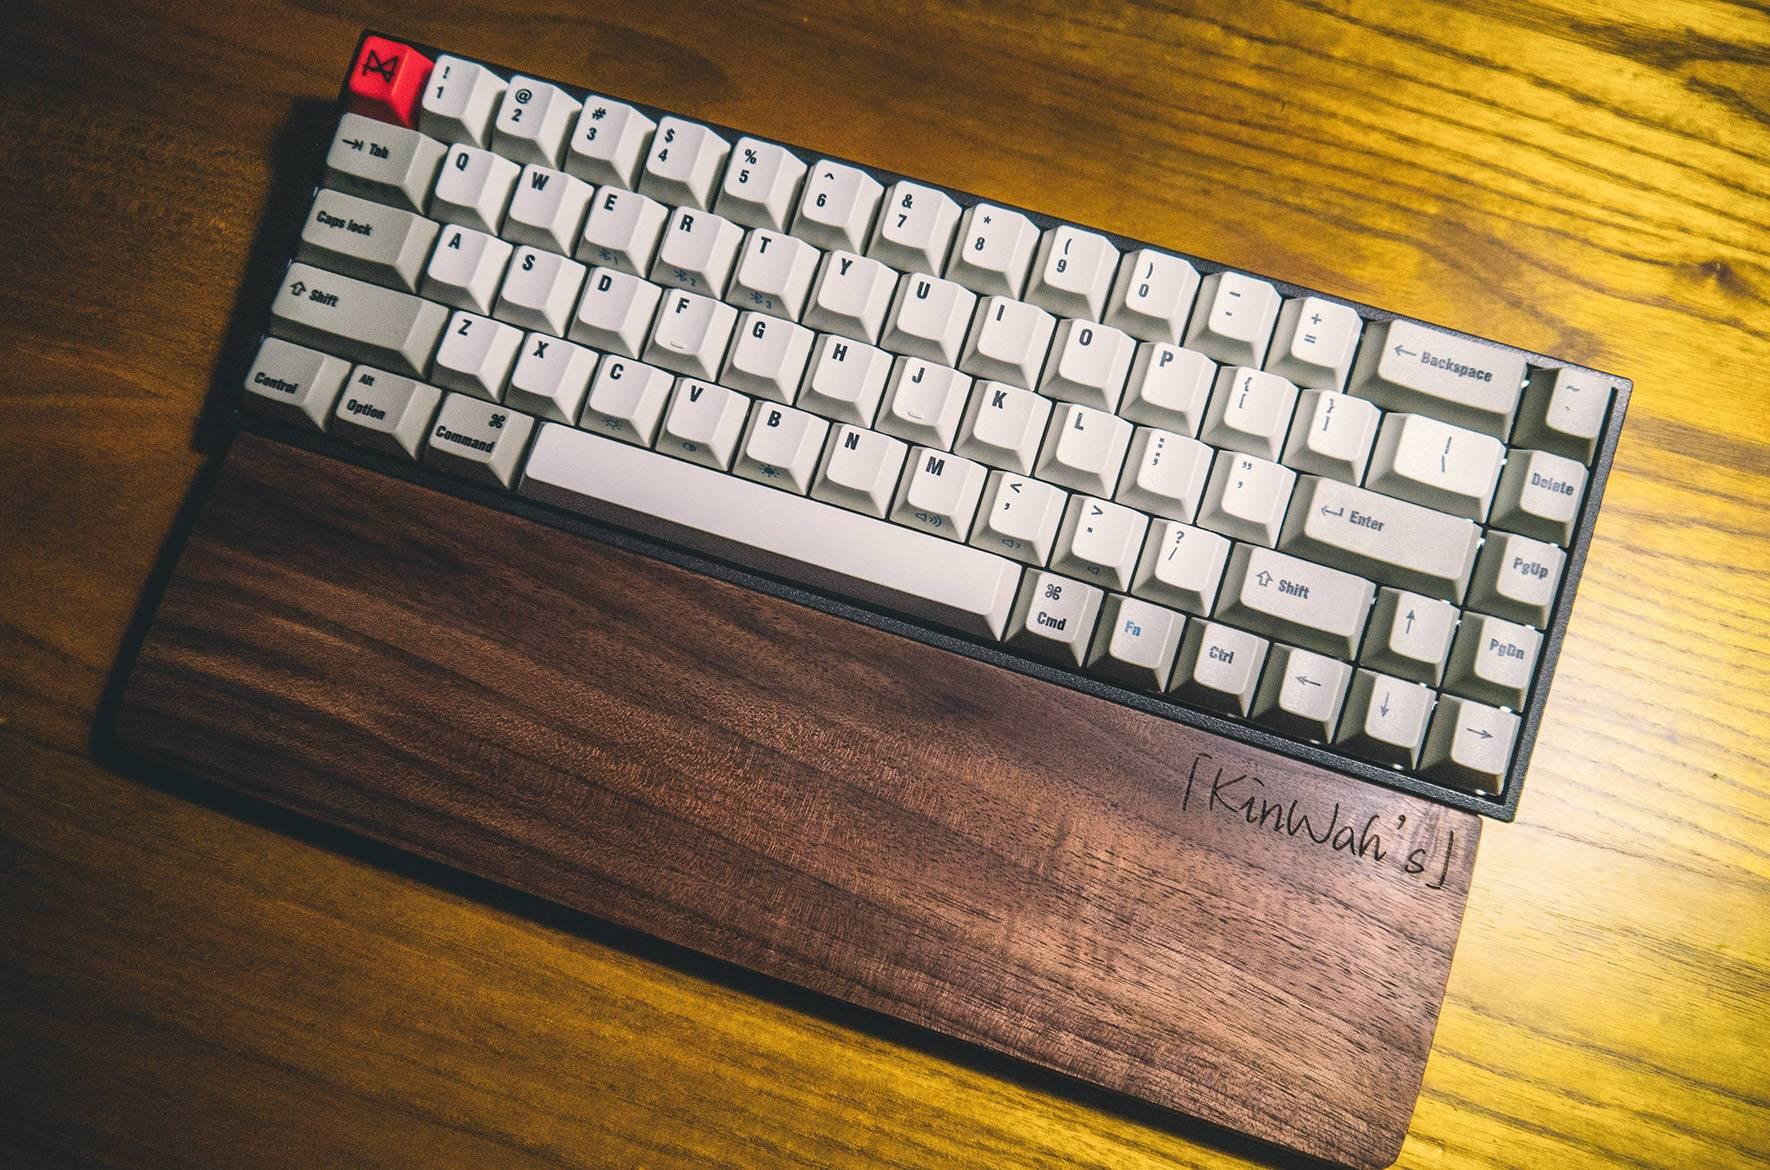 Tada68 Pro Keyboard